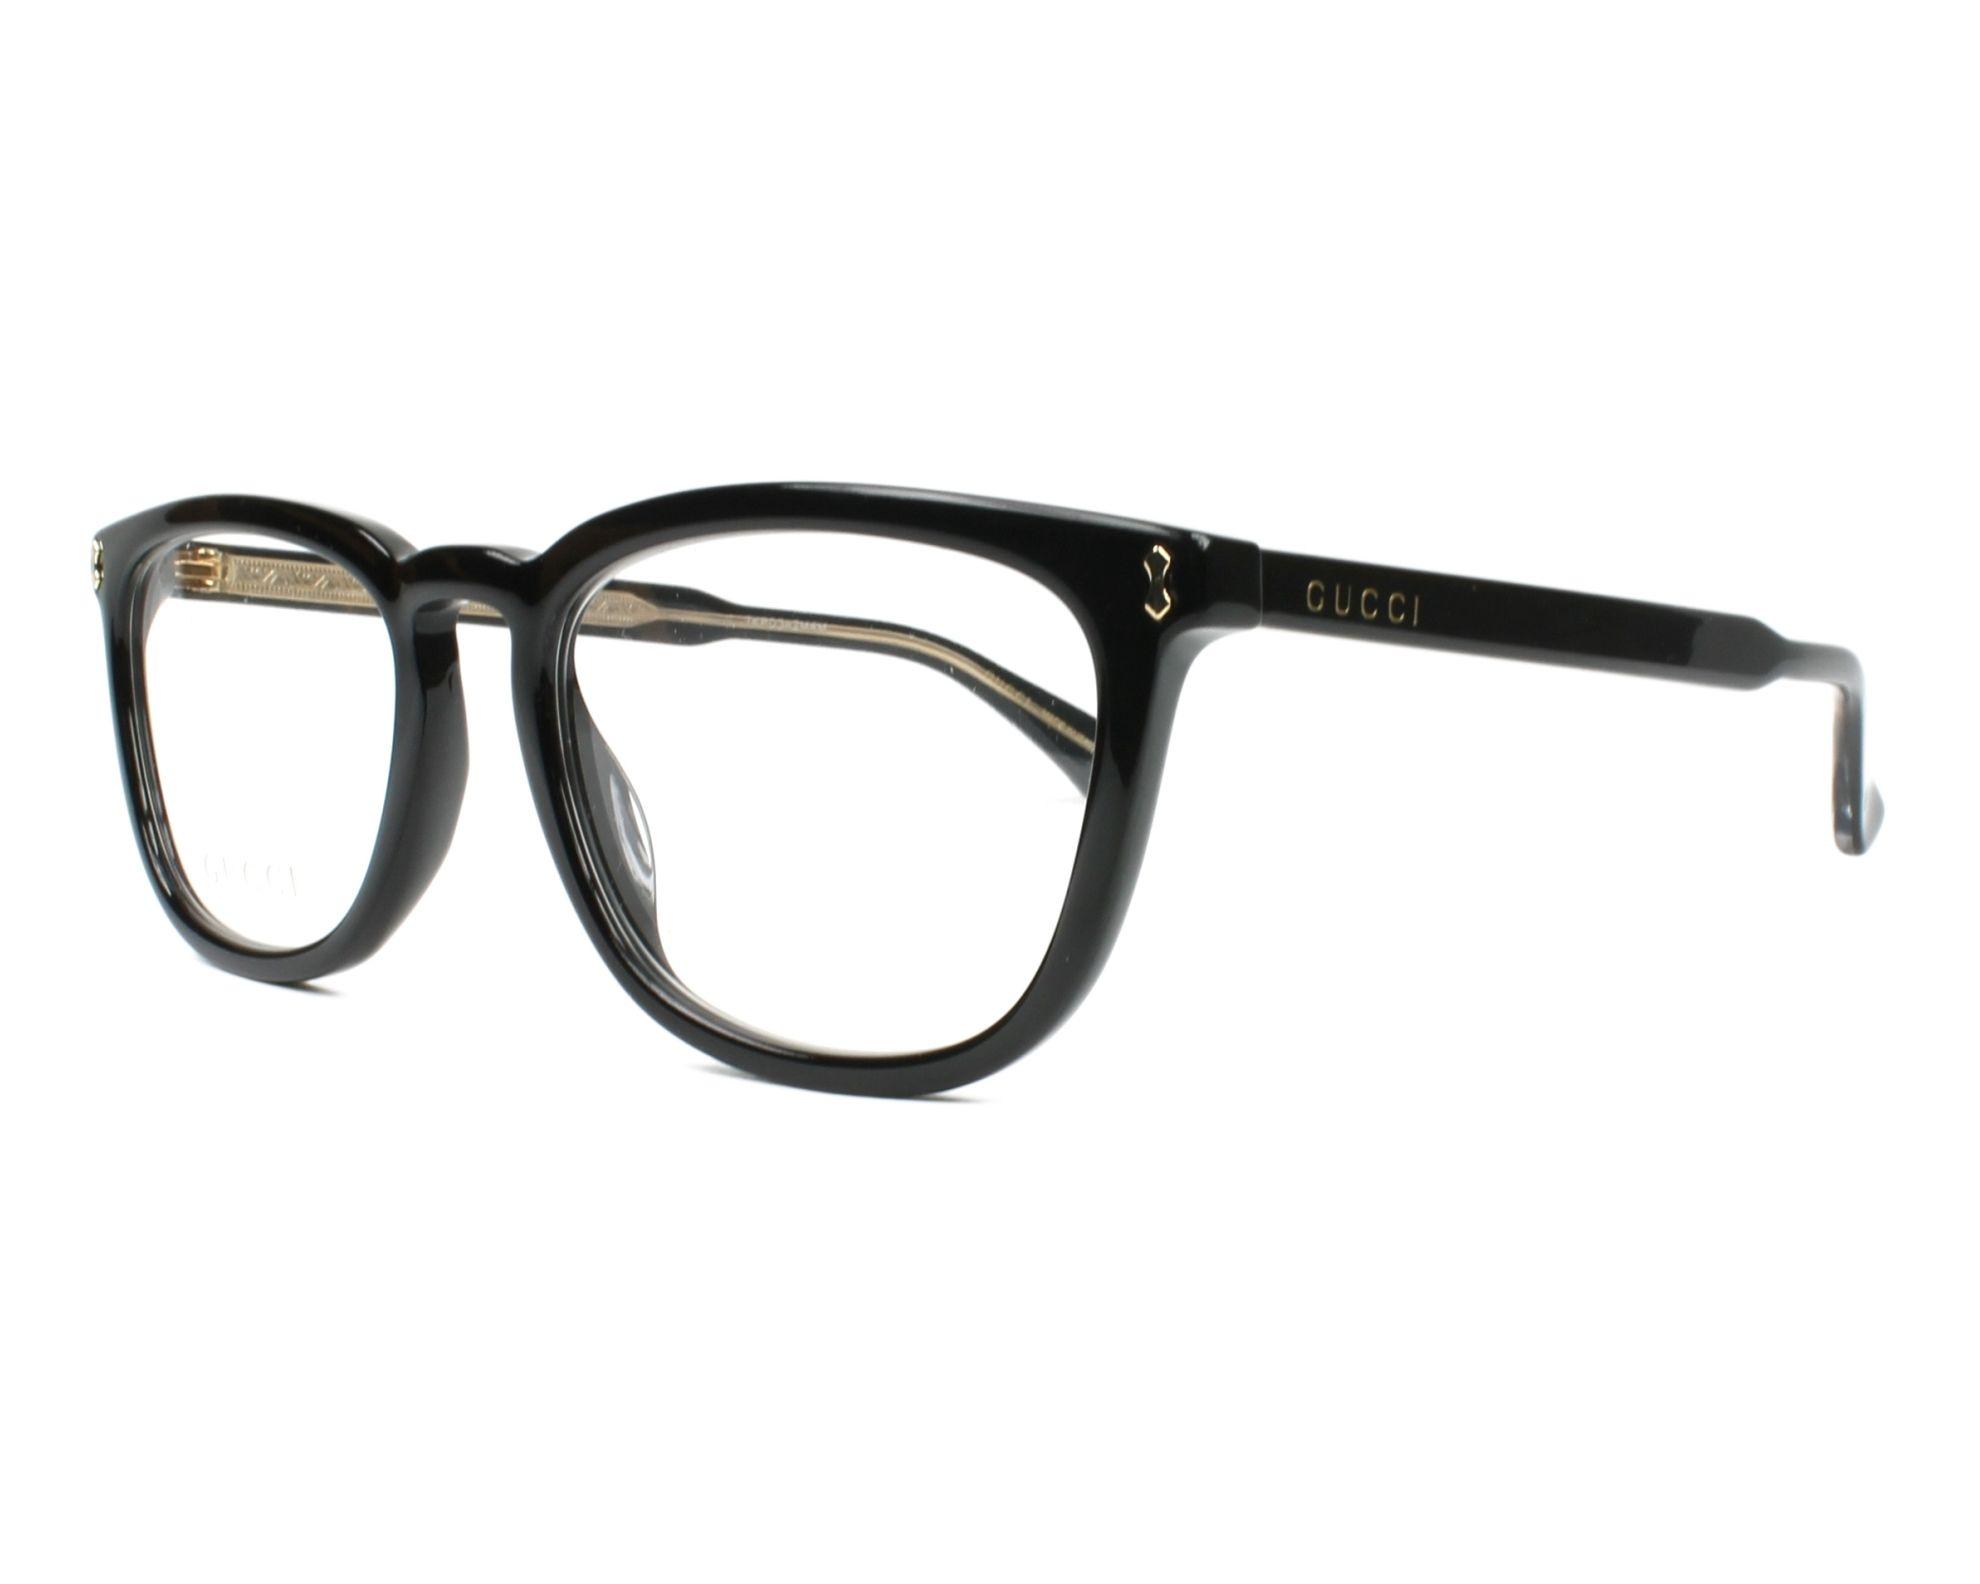 598e3c5b0e eyeglasses Gucci GG-0126-O 006 55-20 Black Crystal profile view